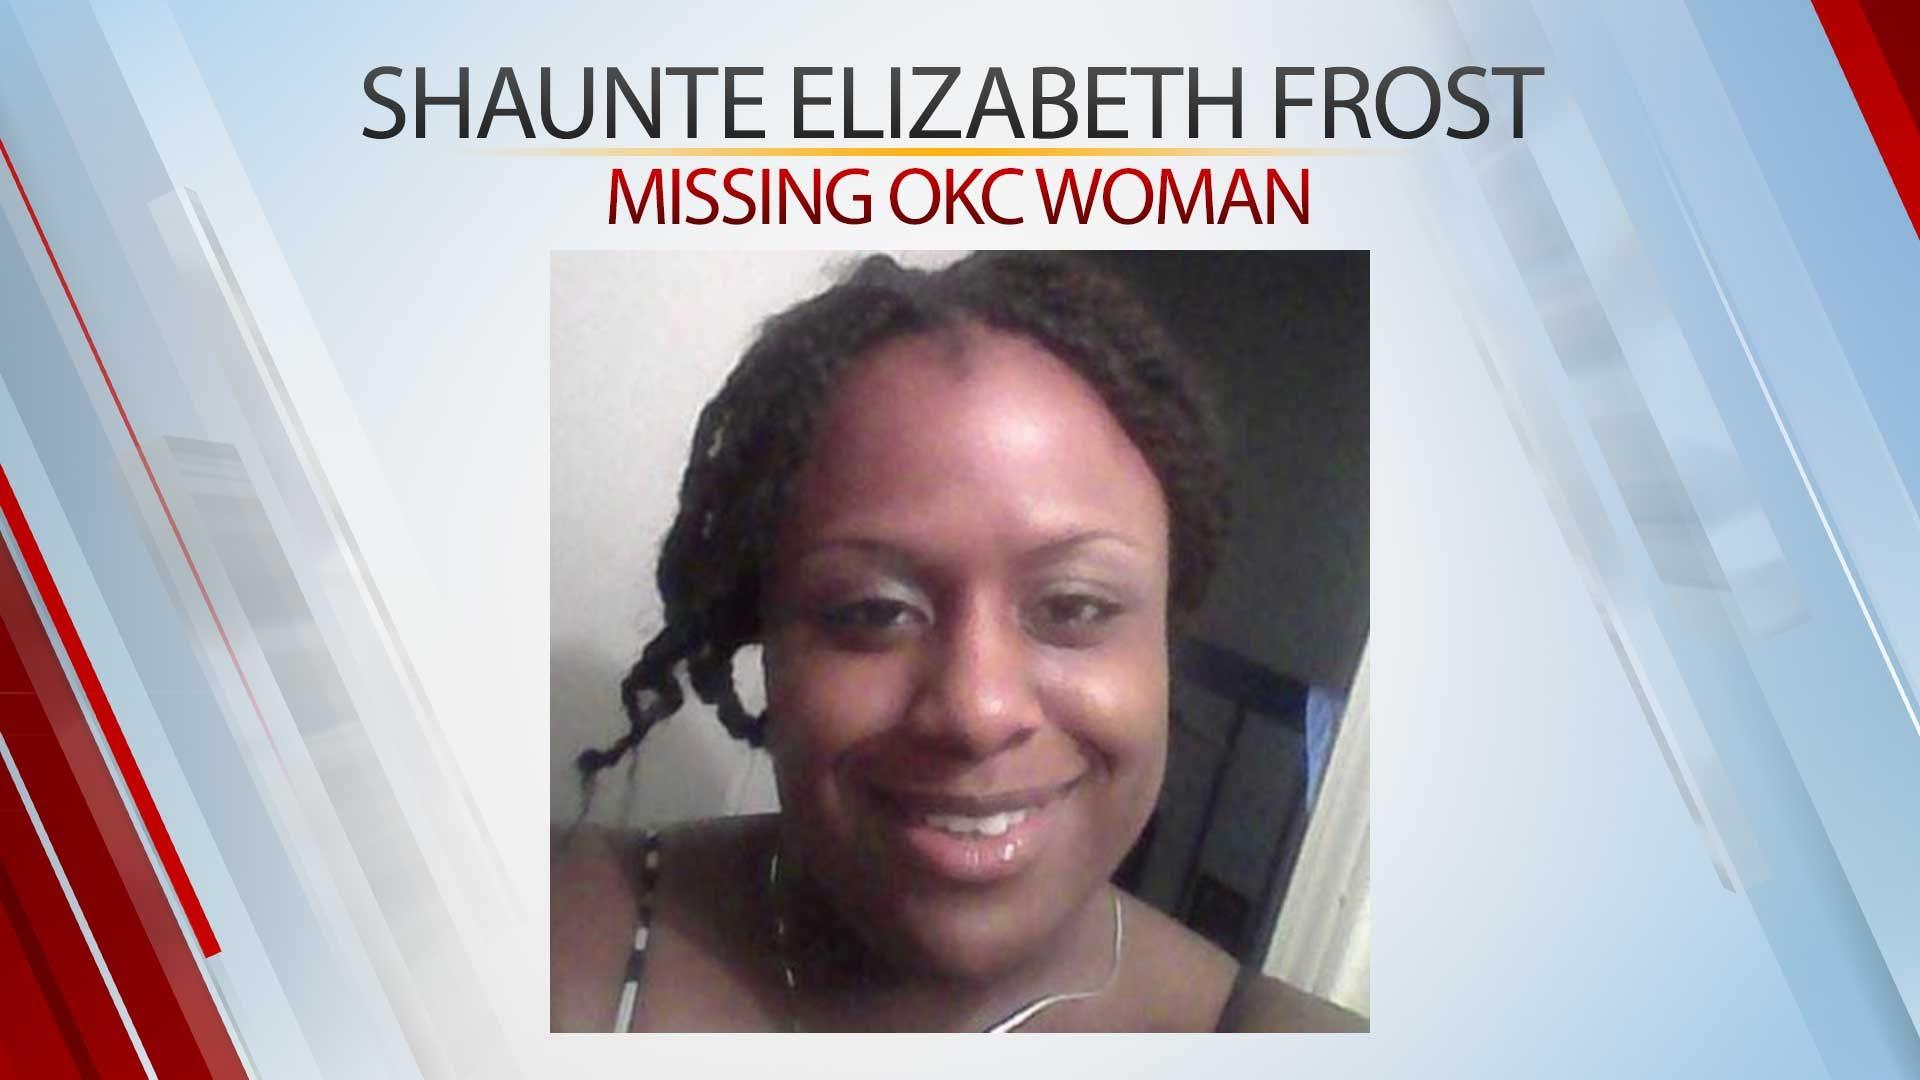 Woman Found, Is Safe, OKC Police Say